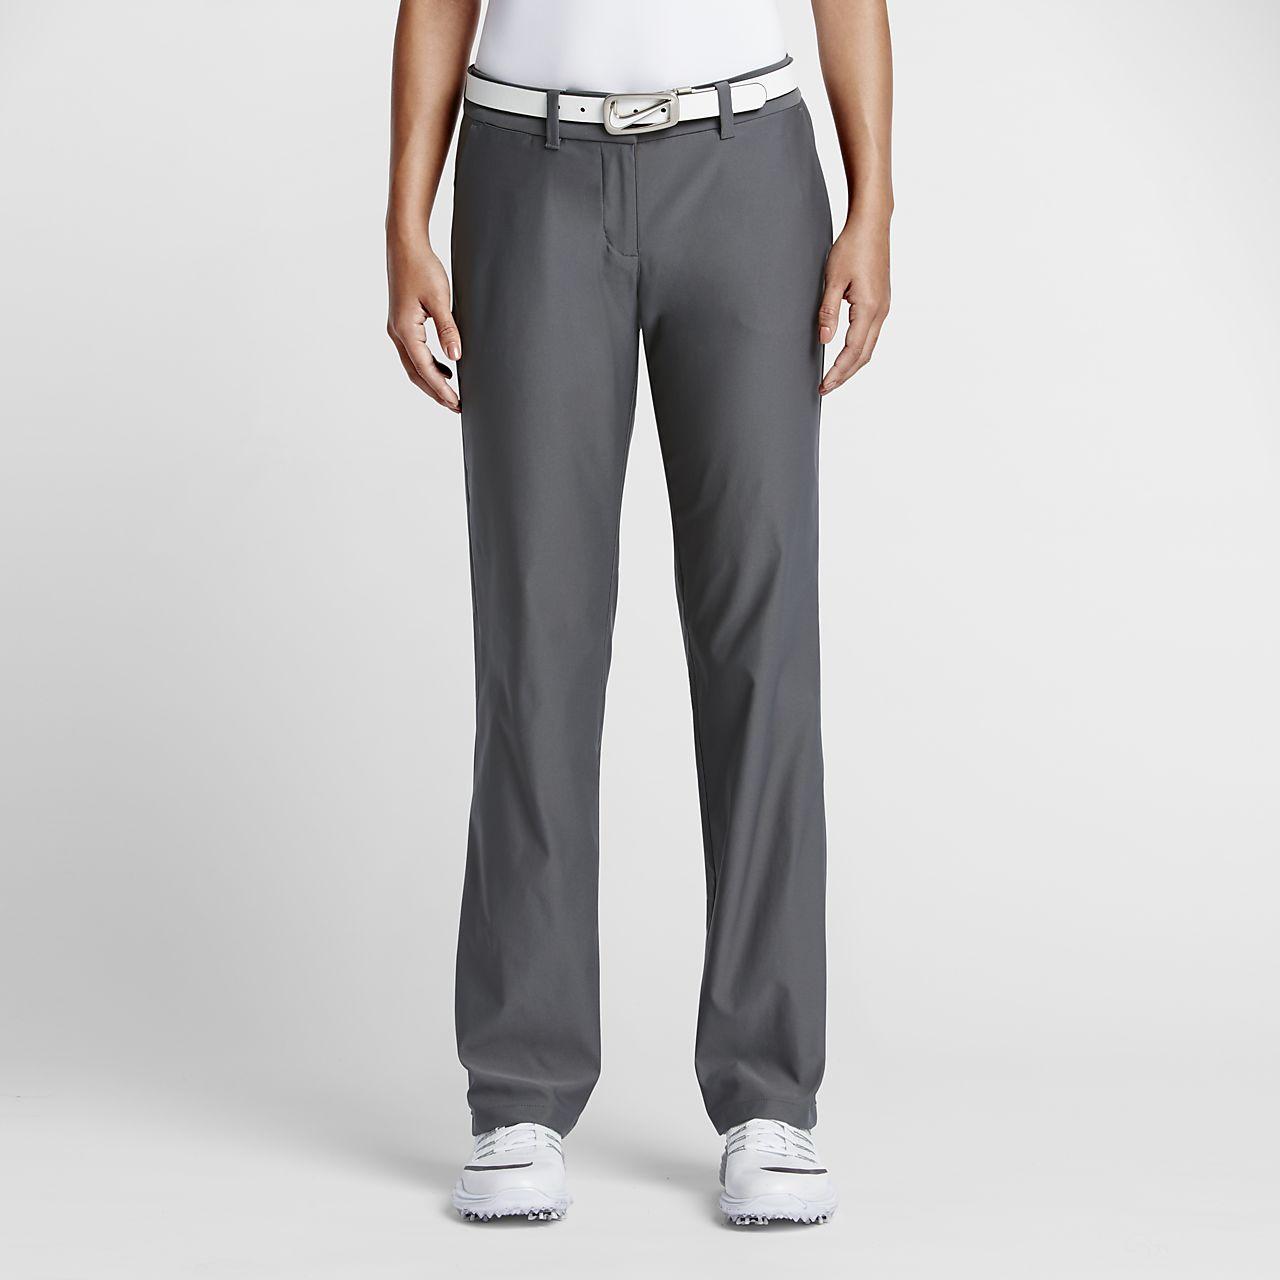 Nike Dry Women's Golf Trousers